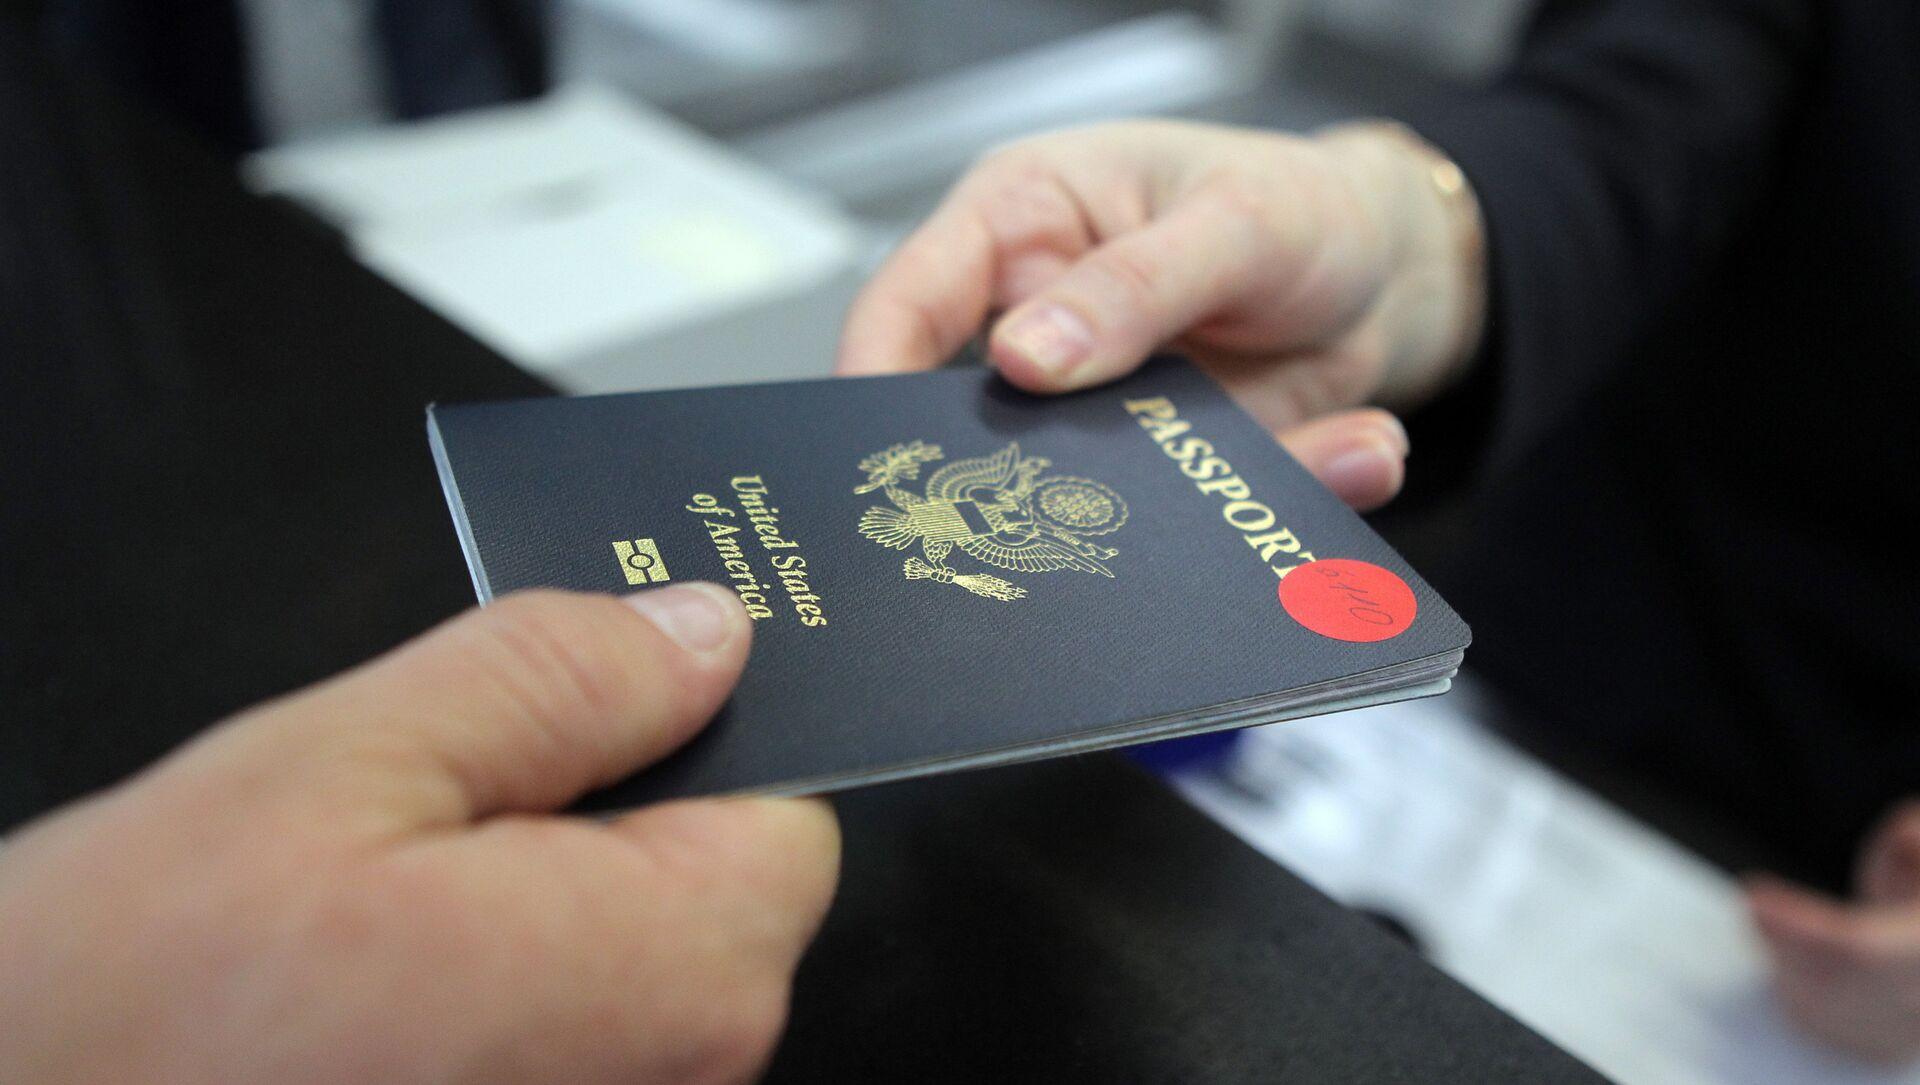 Пассажир предъявляет паспорт гражданина США - Sputnik Արմենիա, 1920, 27.07.2021